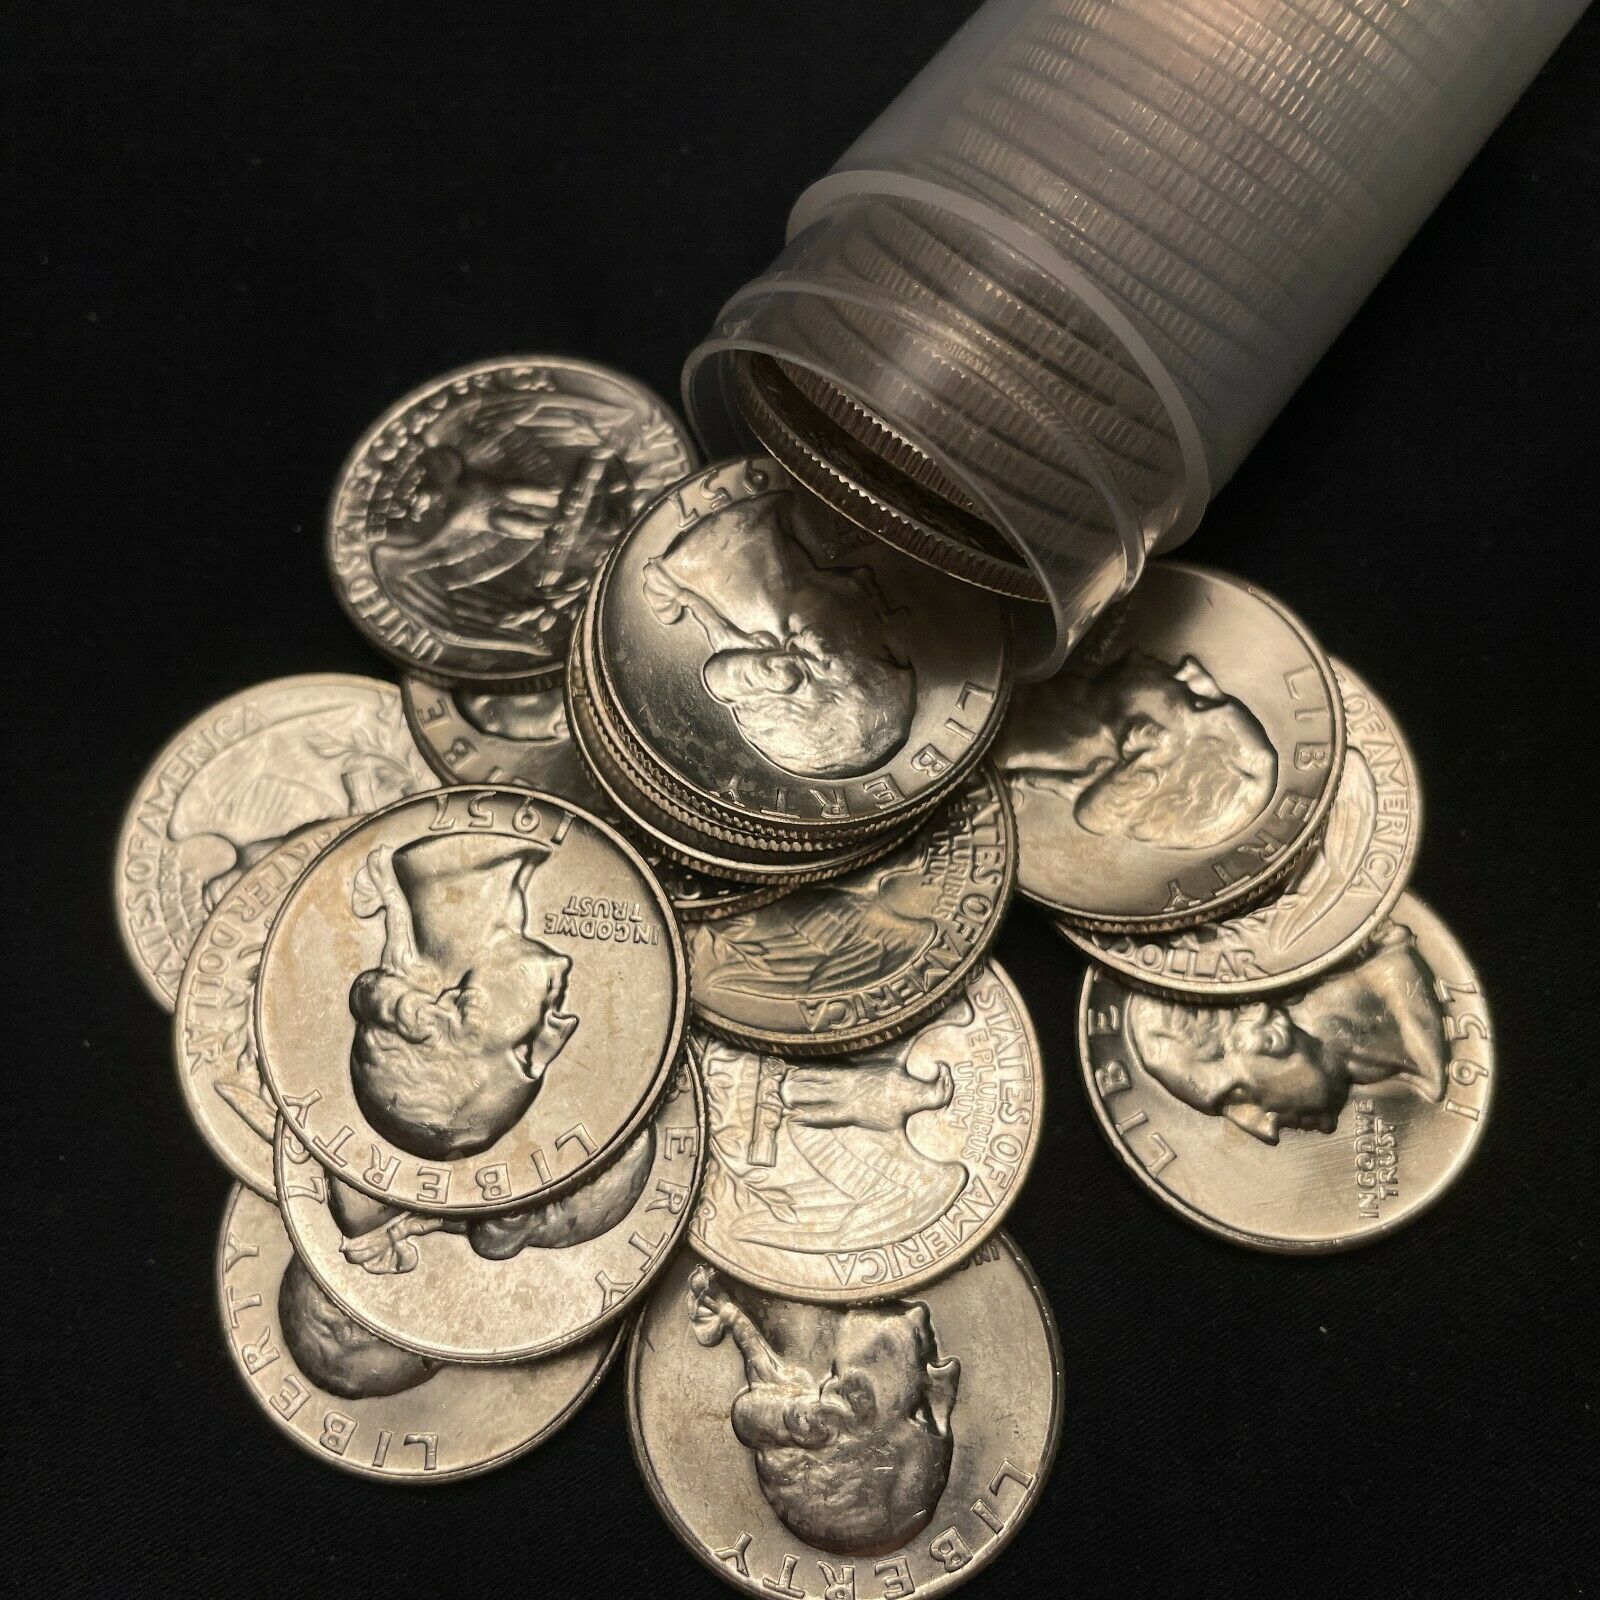 1957-D BU Uncirculated Washington Silver Quarter Original Roll, 40 Coins  - $307.99